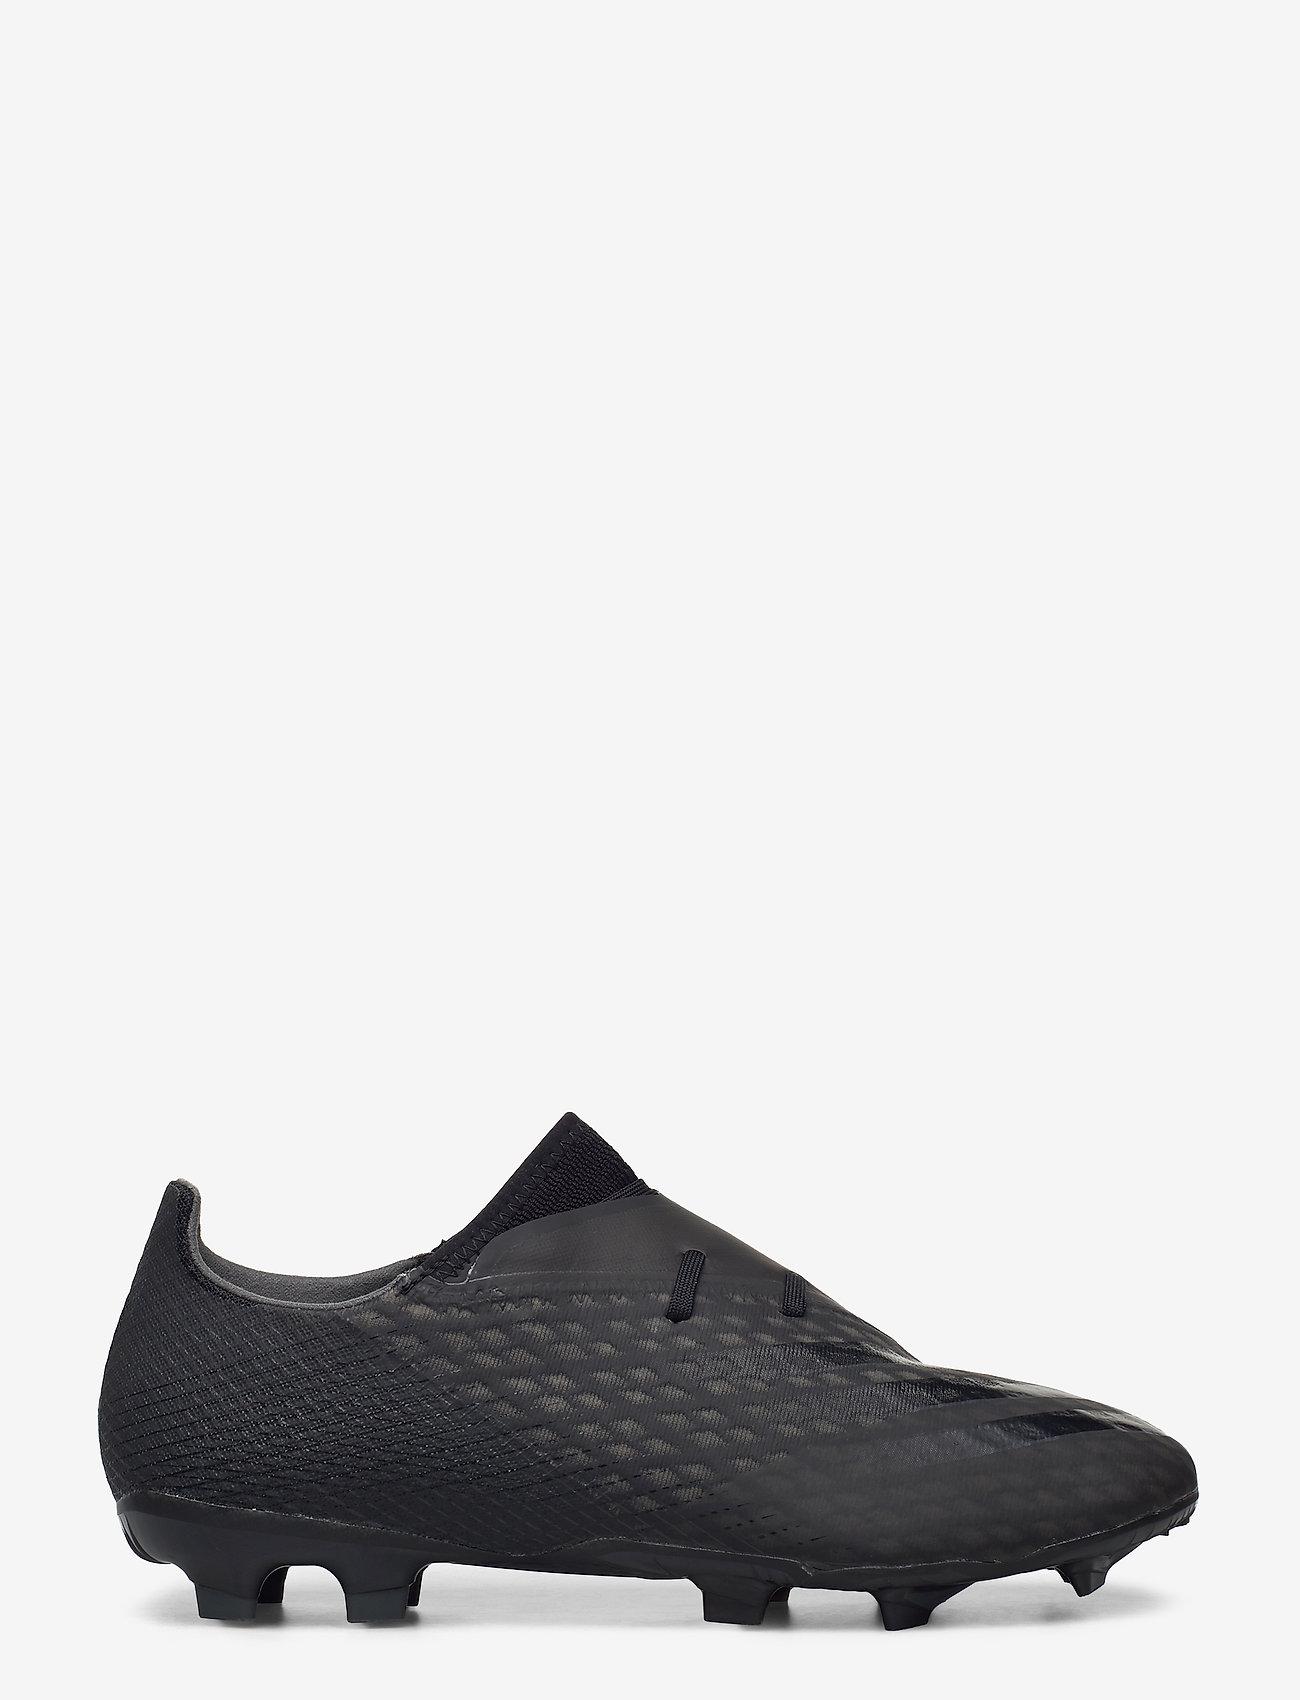 adidas Performance - X GHOSTED.2 FG - fotbollsskor - cblack/cblack/gresix - 1